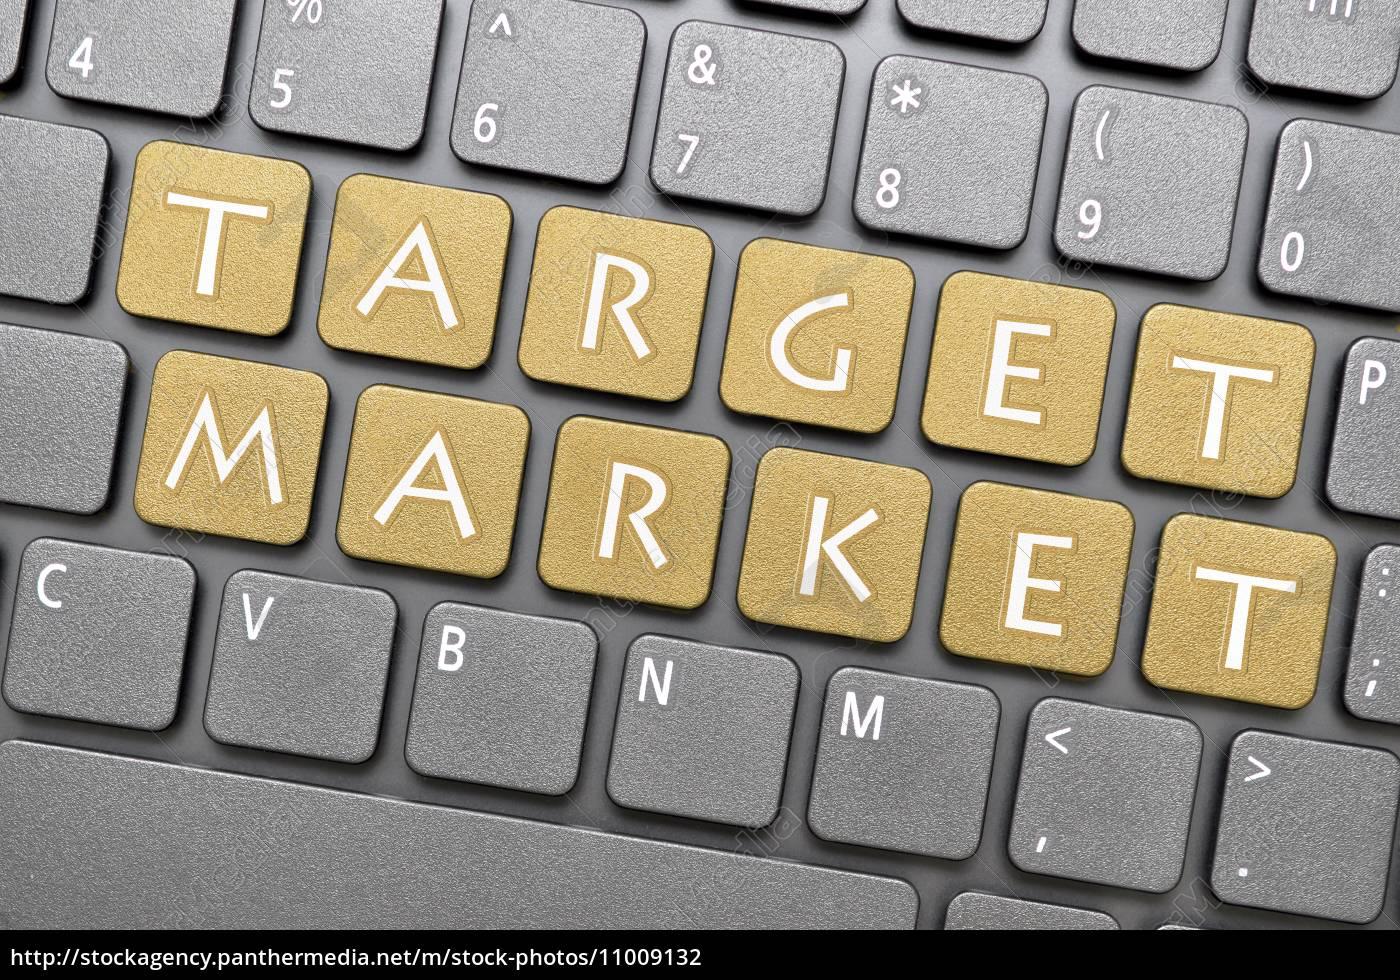 target, market, on, keyboard - 11009132